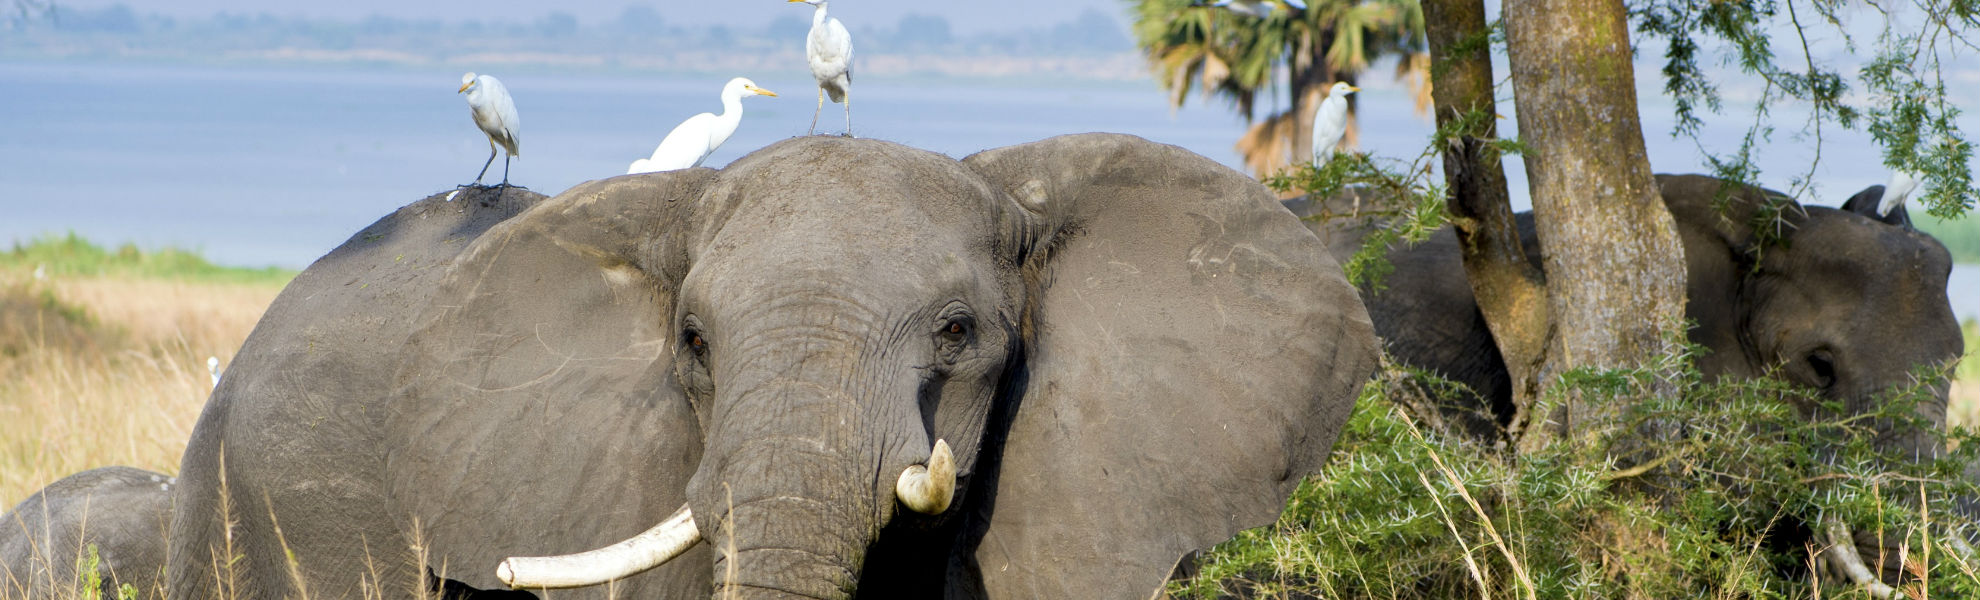 Gorilla Uganda Ruanda Gruppenreise Reisekontor Schmidt - Gorillatracking